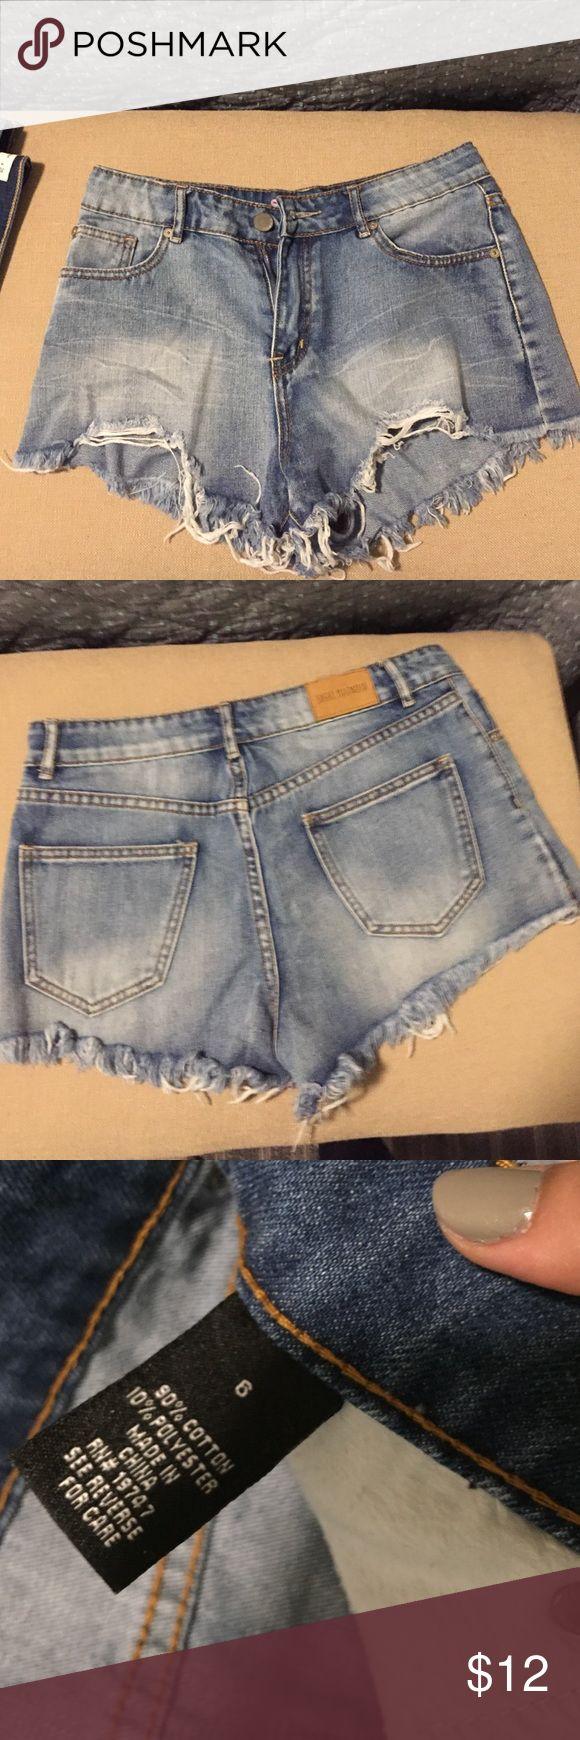 Mid ride cutoff Jean shorts Great condition size 6 Shorts Jean Shorts